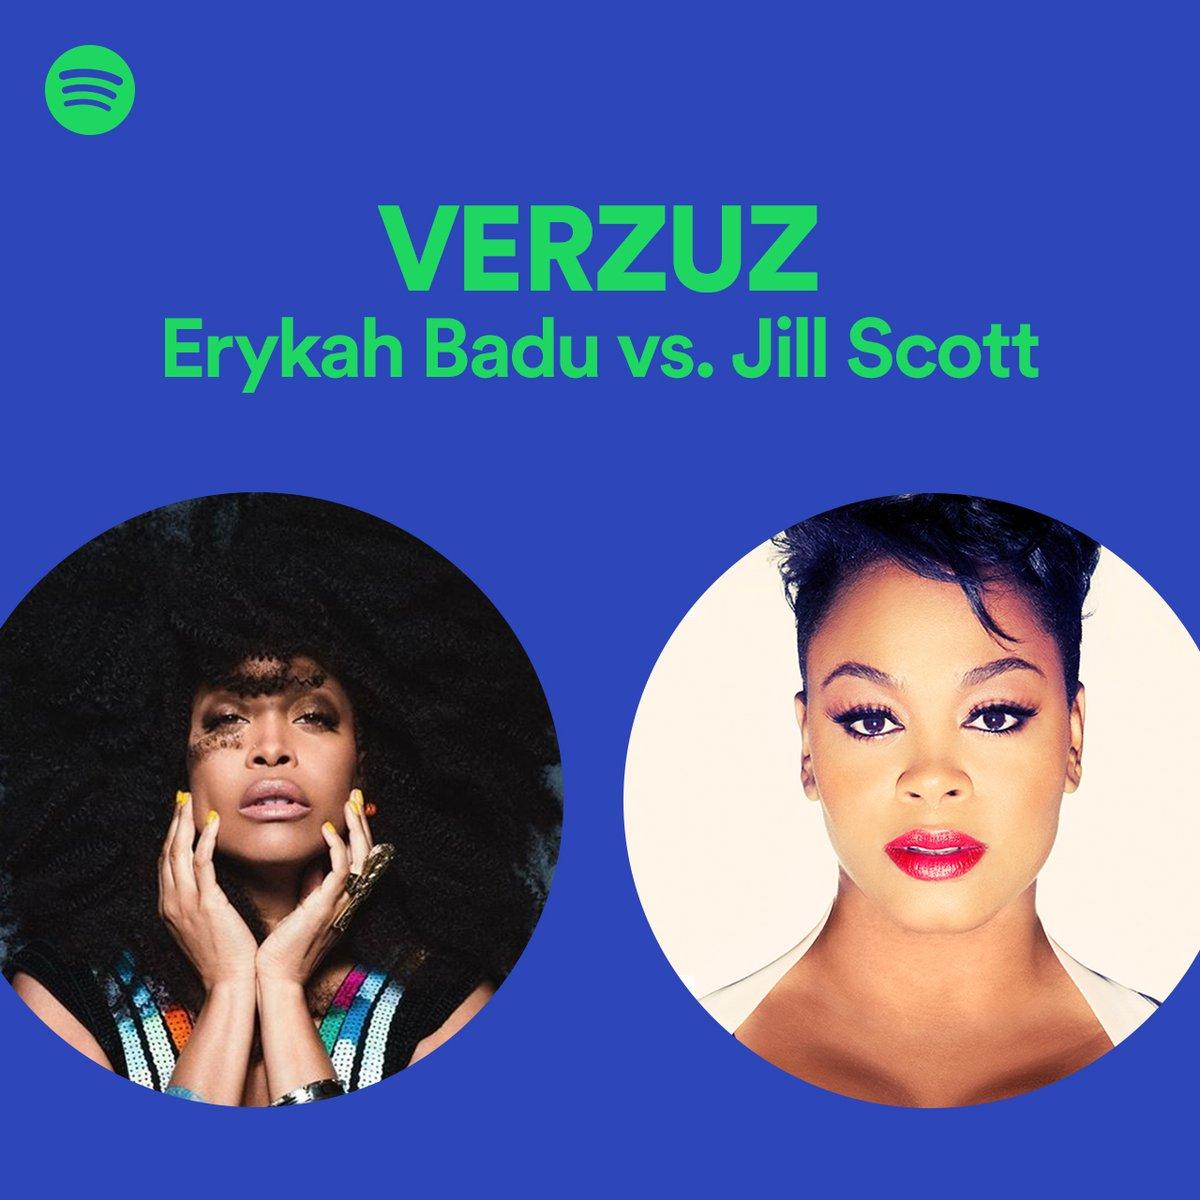 Two queens of R&B 👑 Erykah Badu vs. Jill Scott. The #Verzuz playlist. spoti.fi/ErykahvsJill 💚 @fatbellybella @missjillscott